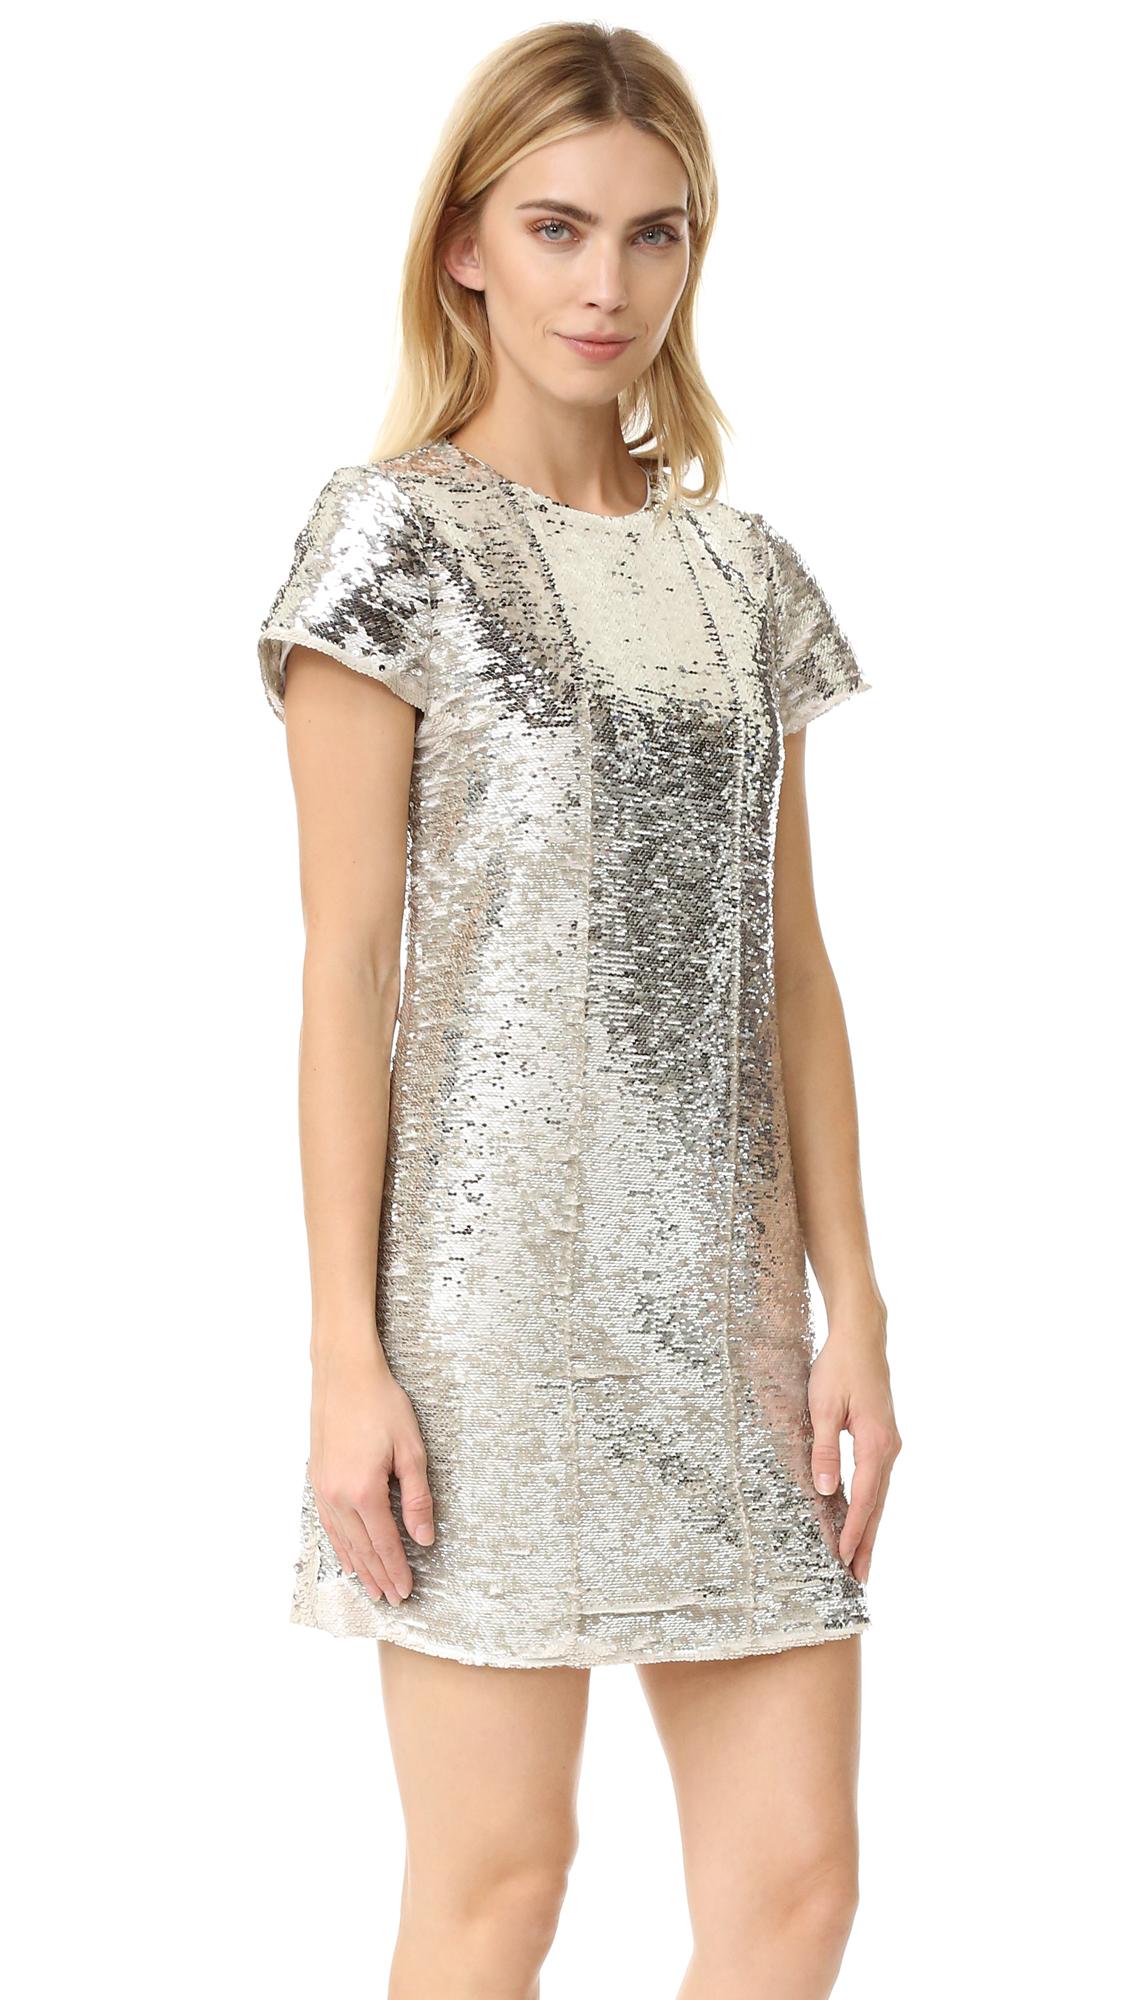 Rebecca Minkoff Lynx Sequin Dress - Gold/Silver